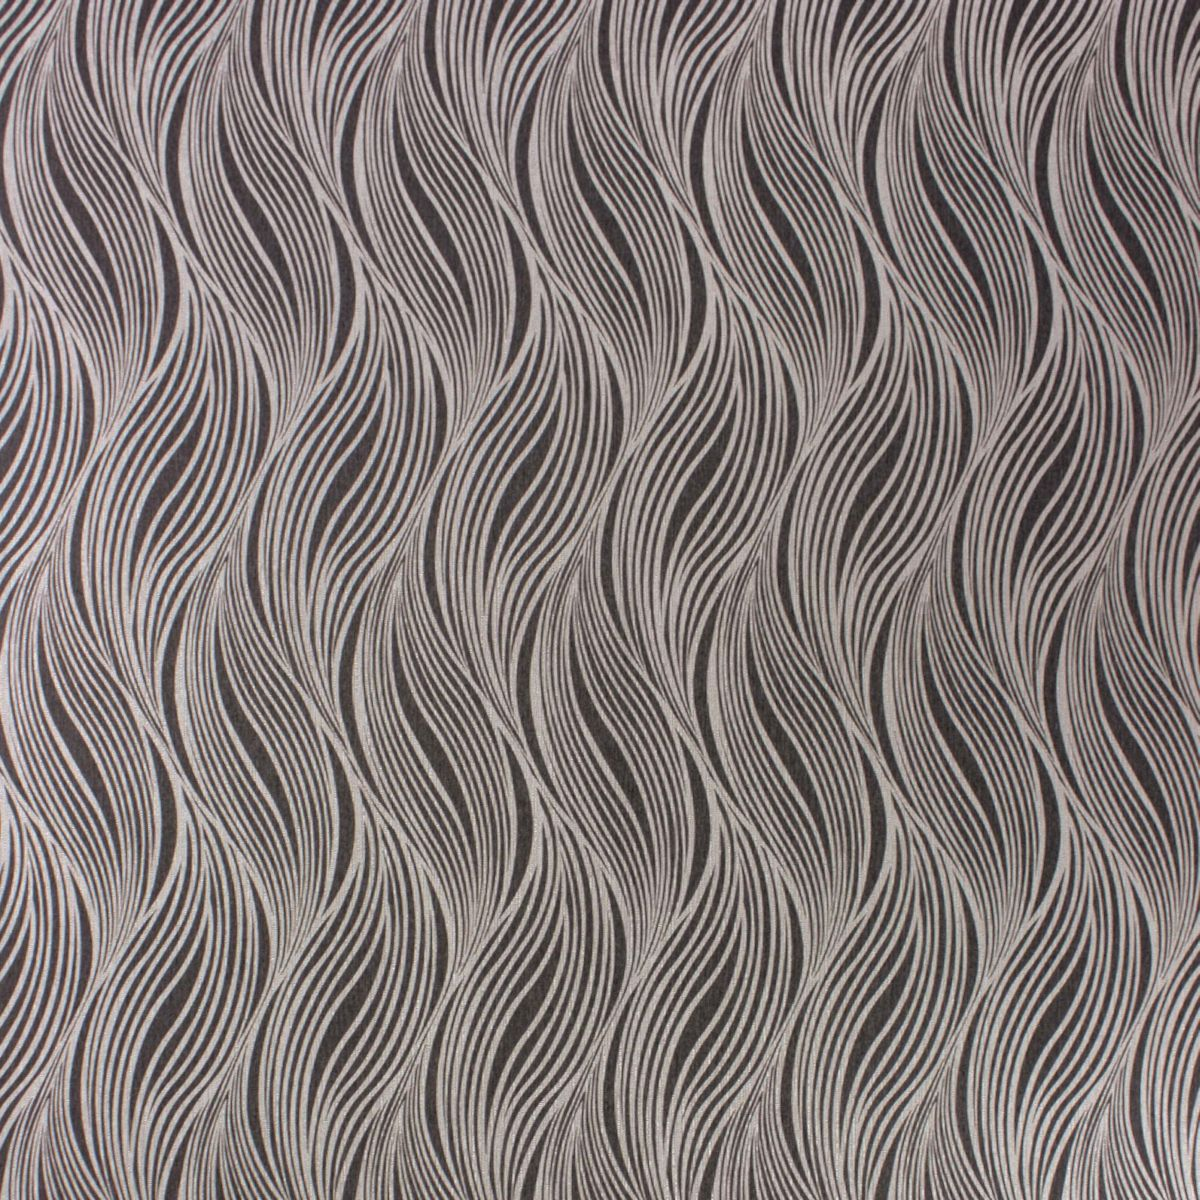 hochwertige tapeten und stoffe vinyltapete osborne little intarsia vinyls w6764 03 decowunder. Black Bedroom Furniture Sets. Home Design Ideas